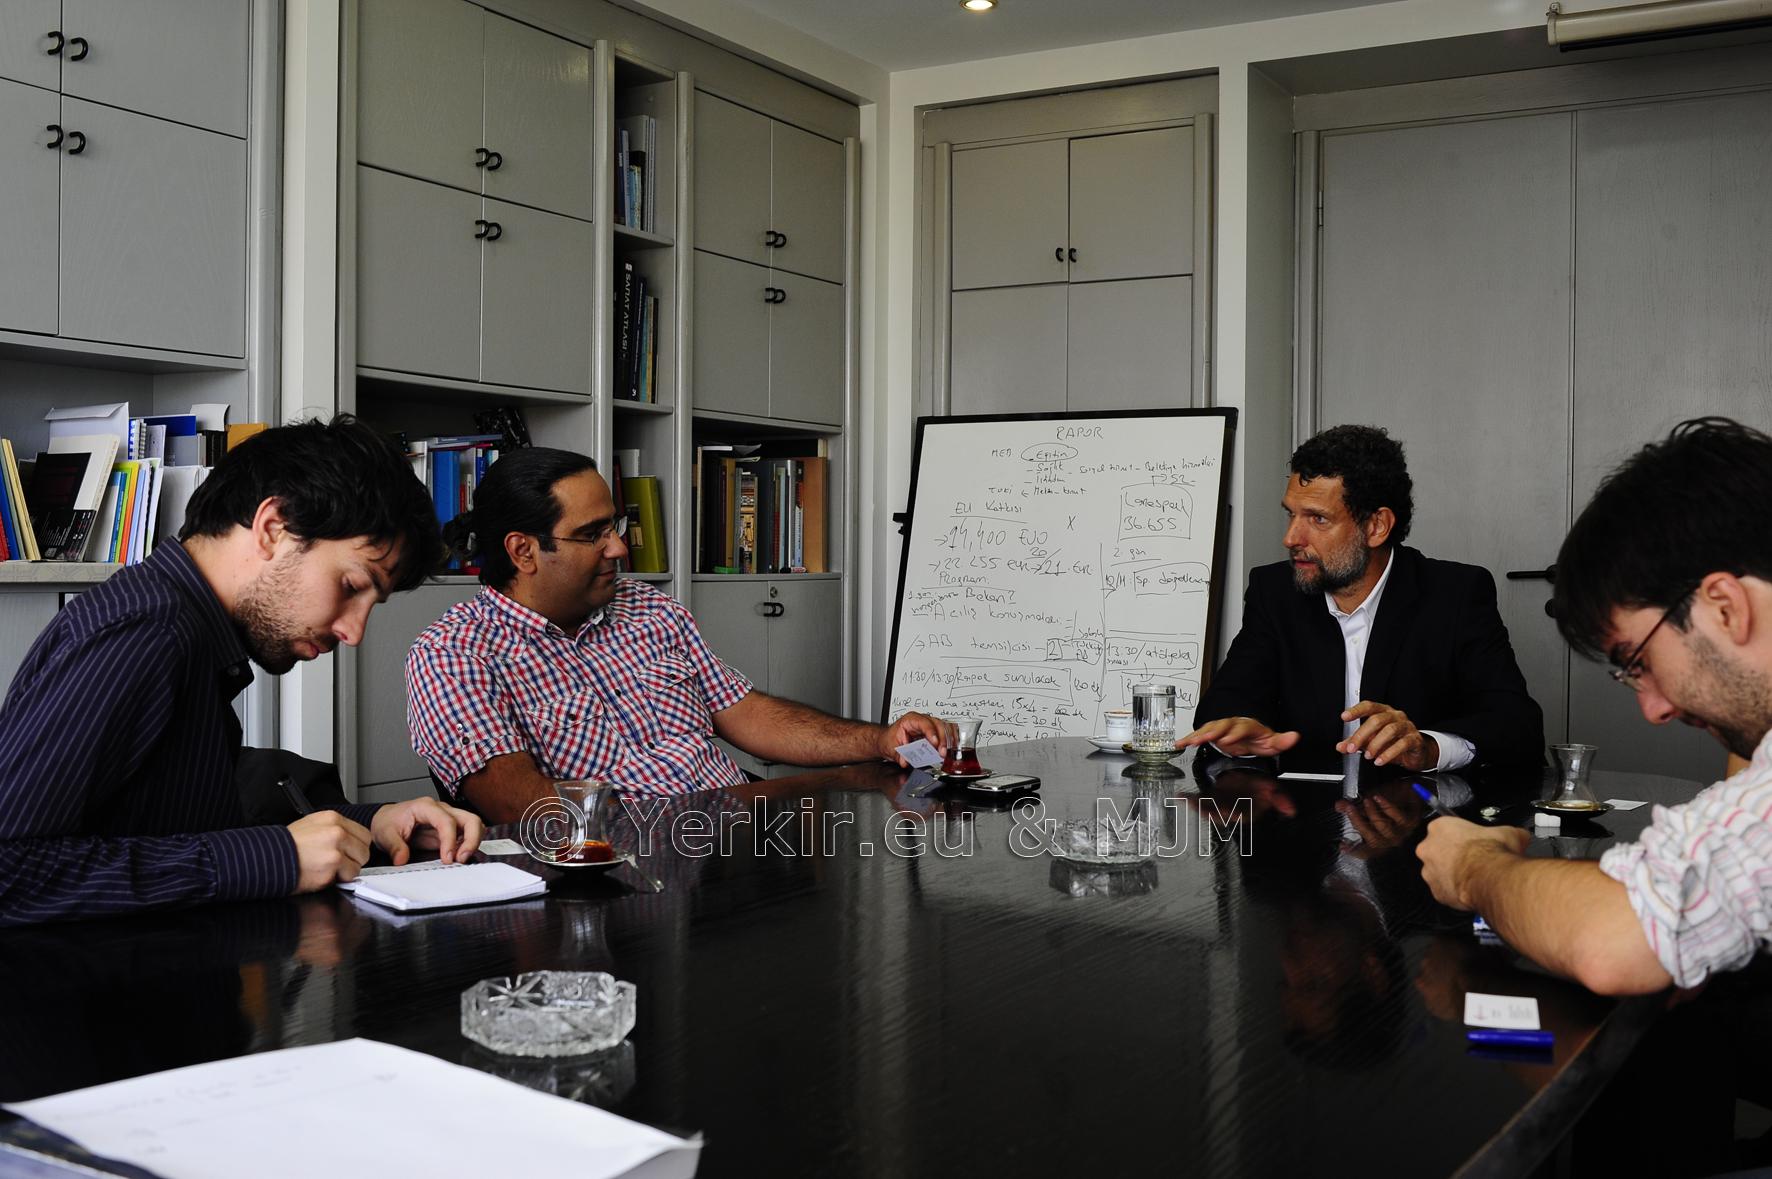 Rencontre avec Osman Kavala de la Fondation Anadolu Kültür